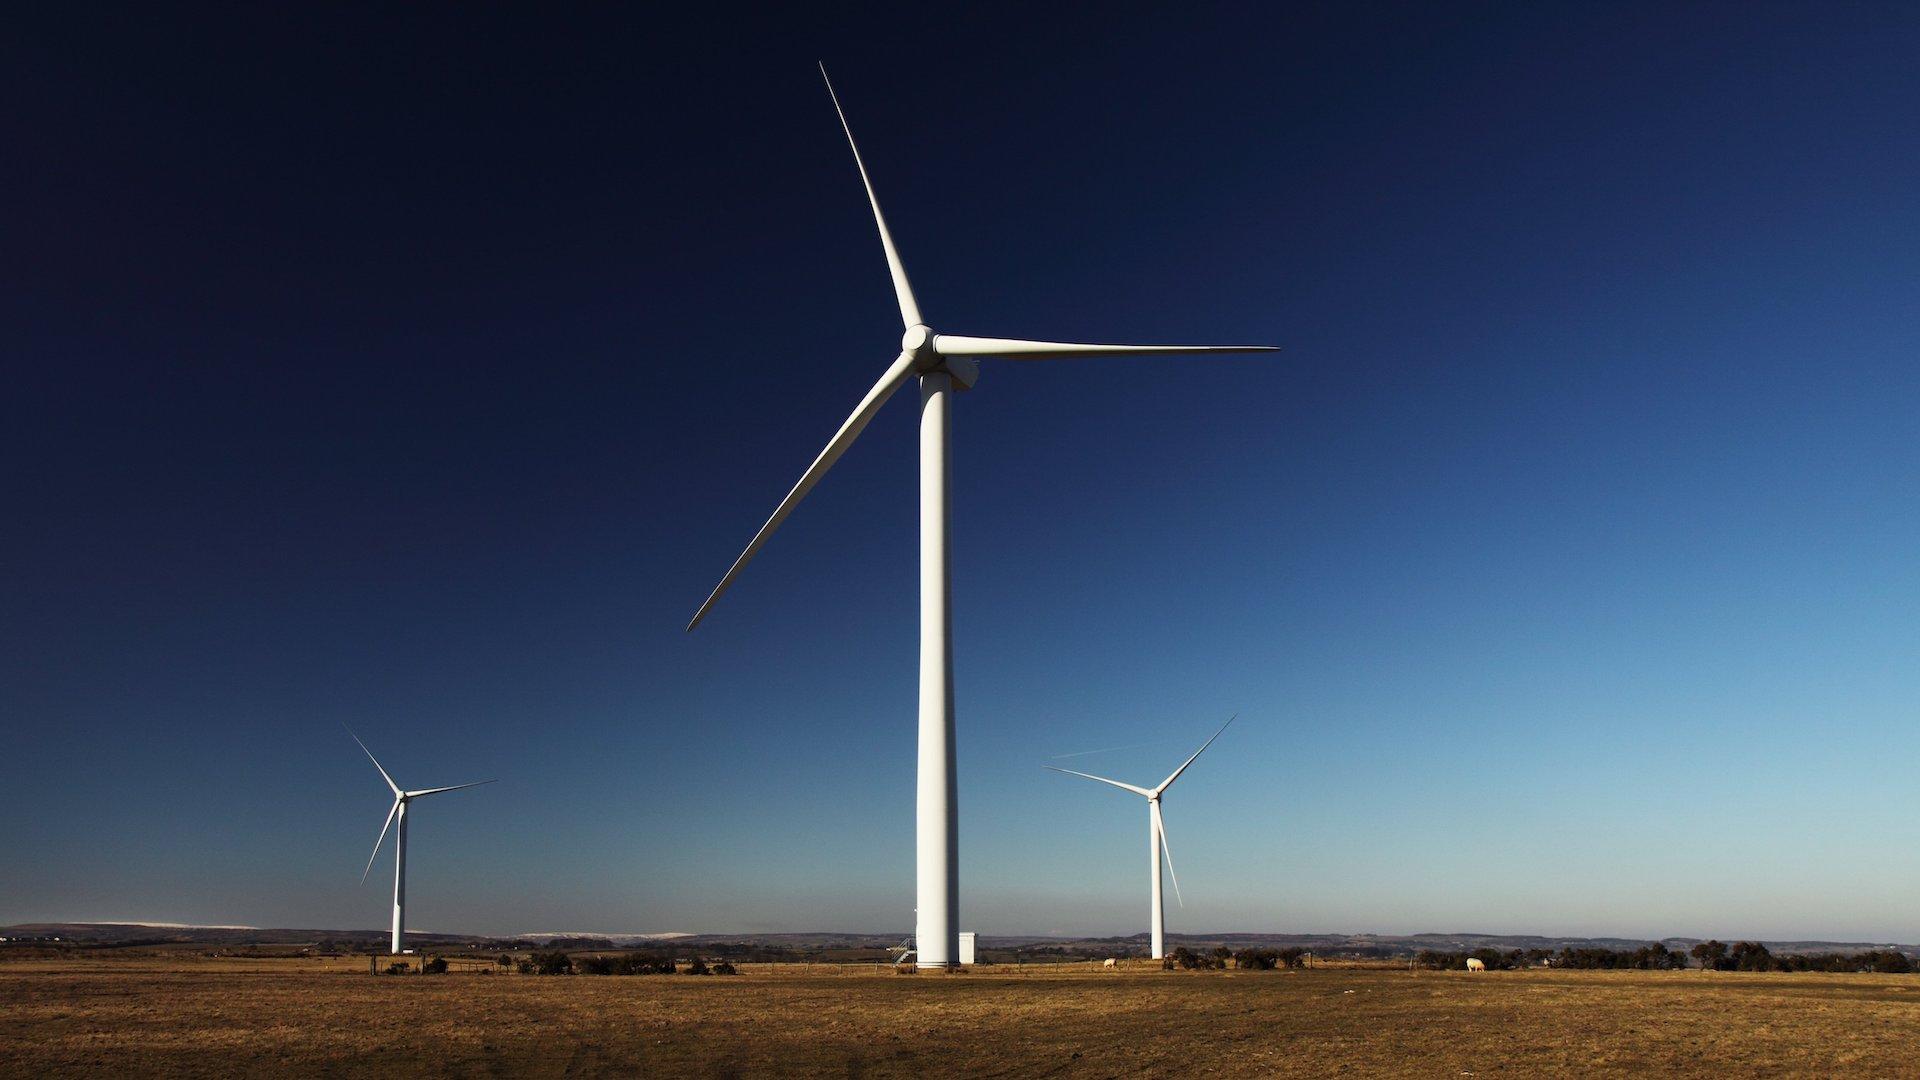 Wind farm - Credits Pixabay